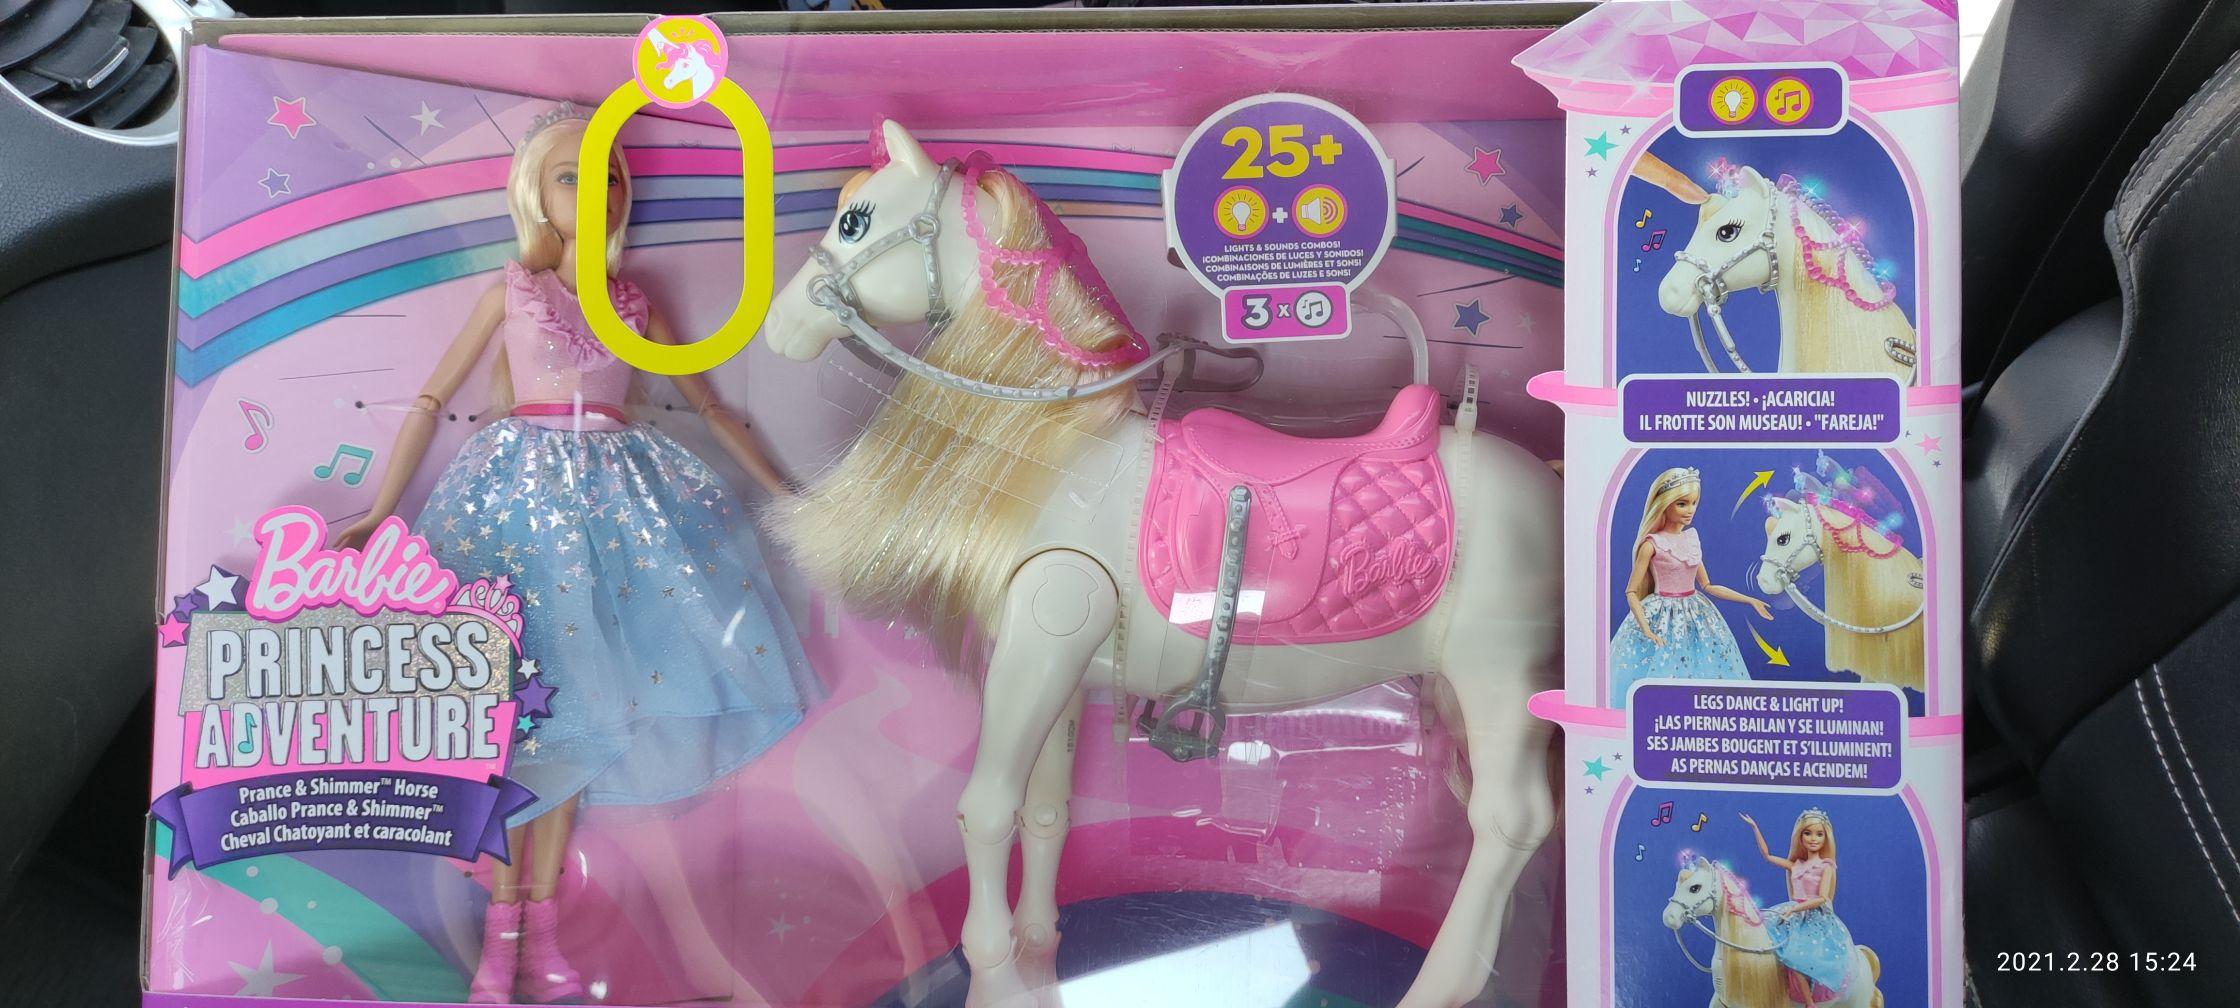 Chedraui - Barbie Princess Adventure